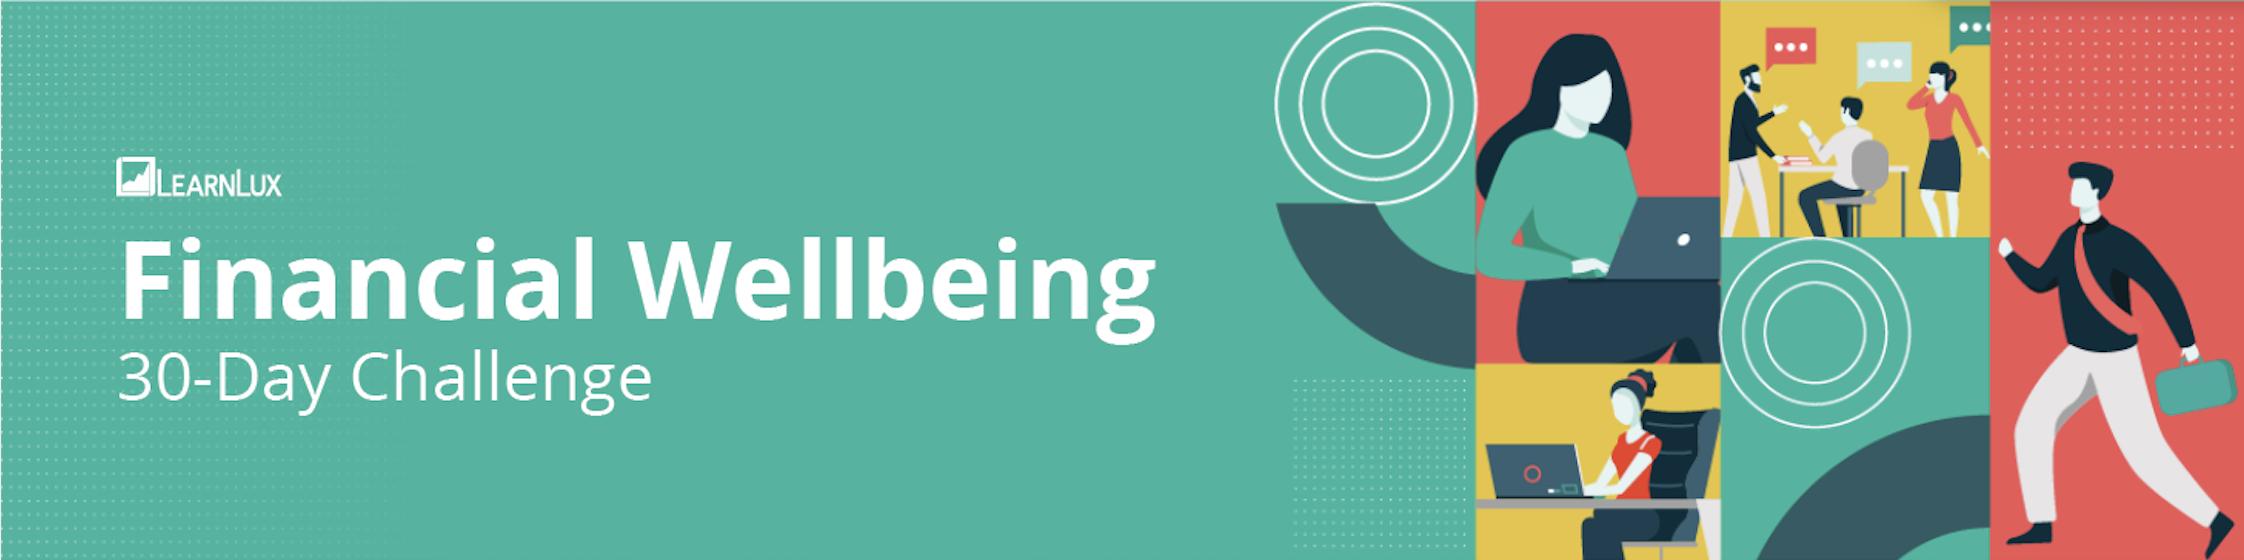 Financial wellbeing challenge banner